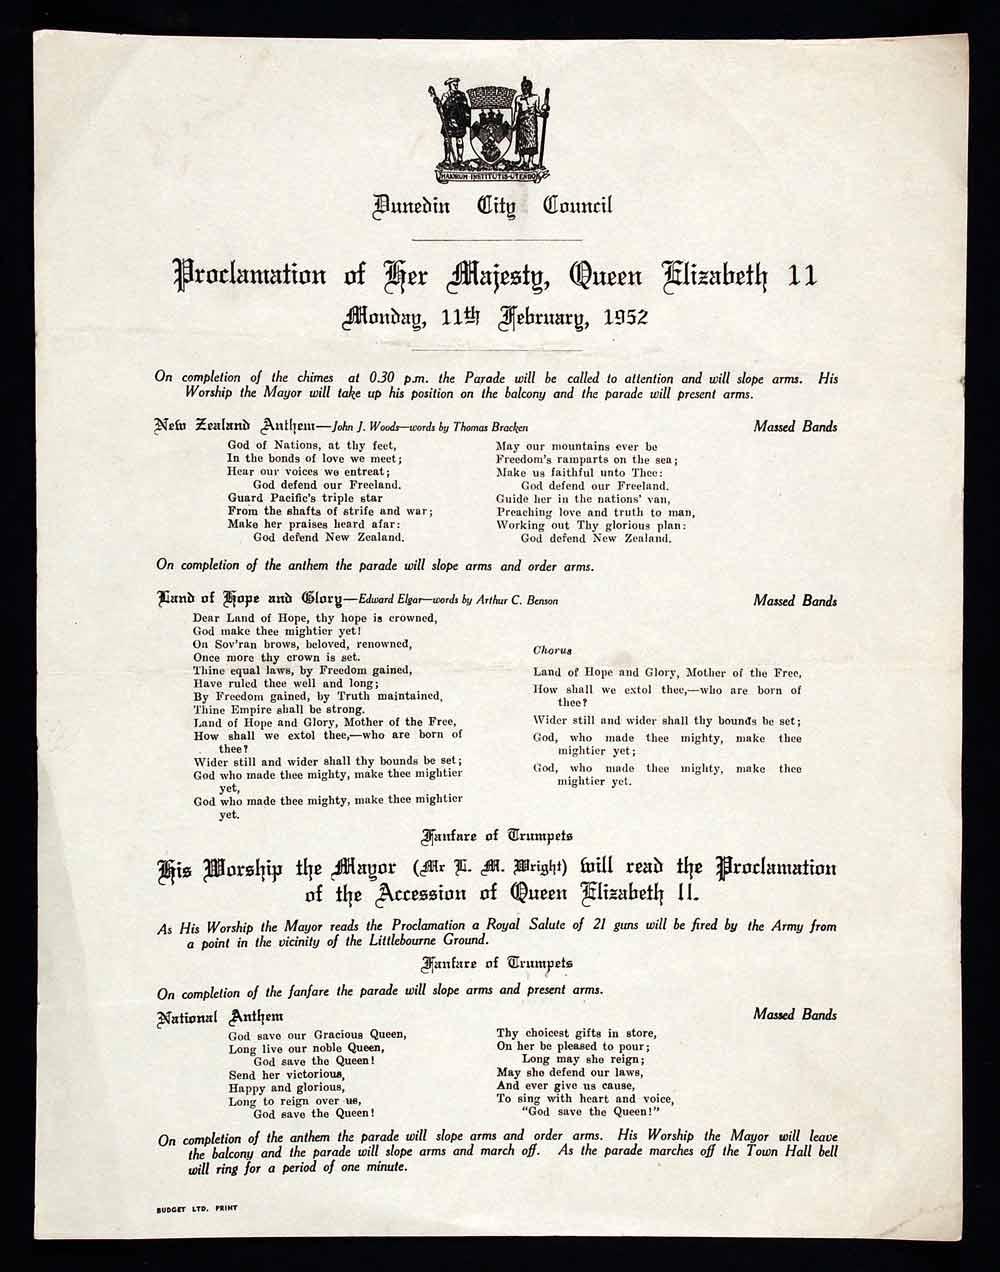 Proclamation of Her Majesty, Queen Elizabeth II; Monday 11th February, 1952. Dunedin: Dunedin City Council, [1952].